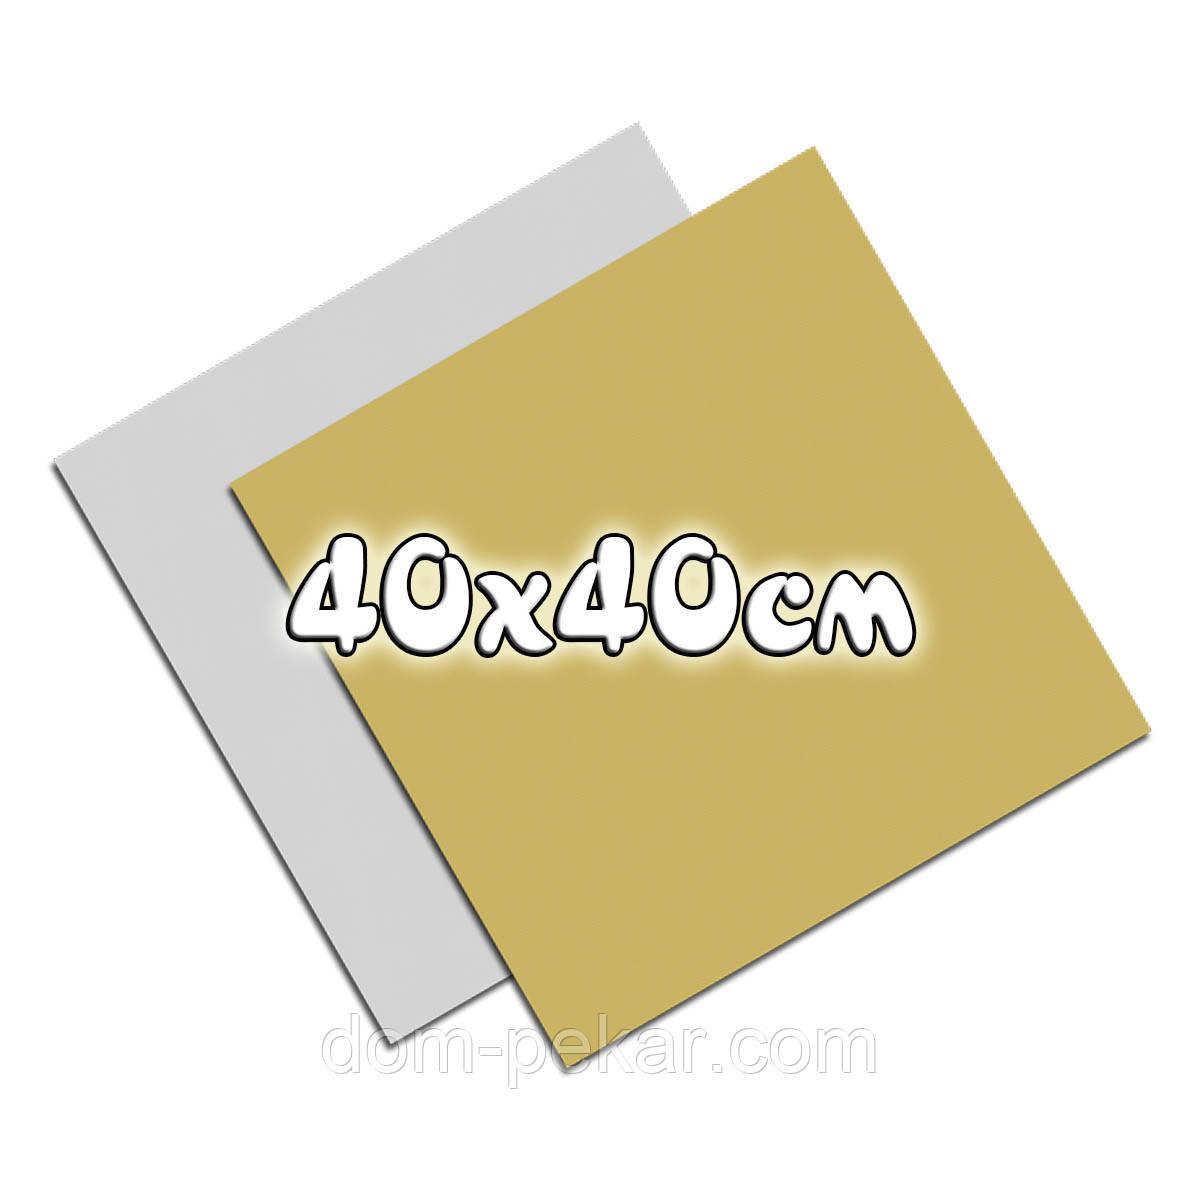 Подложка золото/серебро 400*400 квадратная